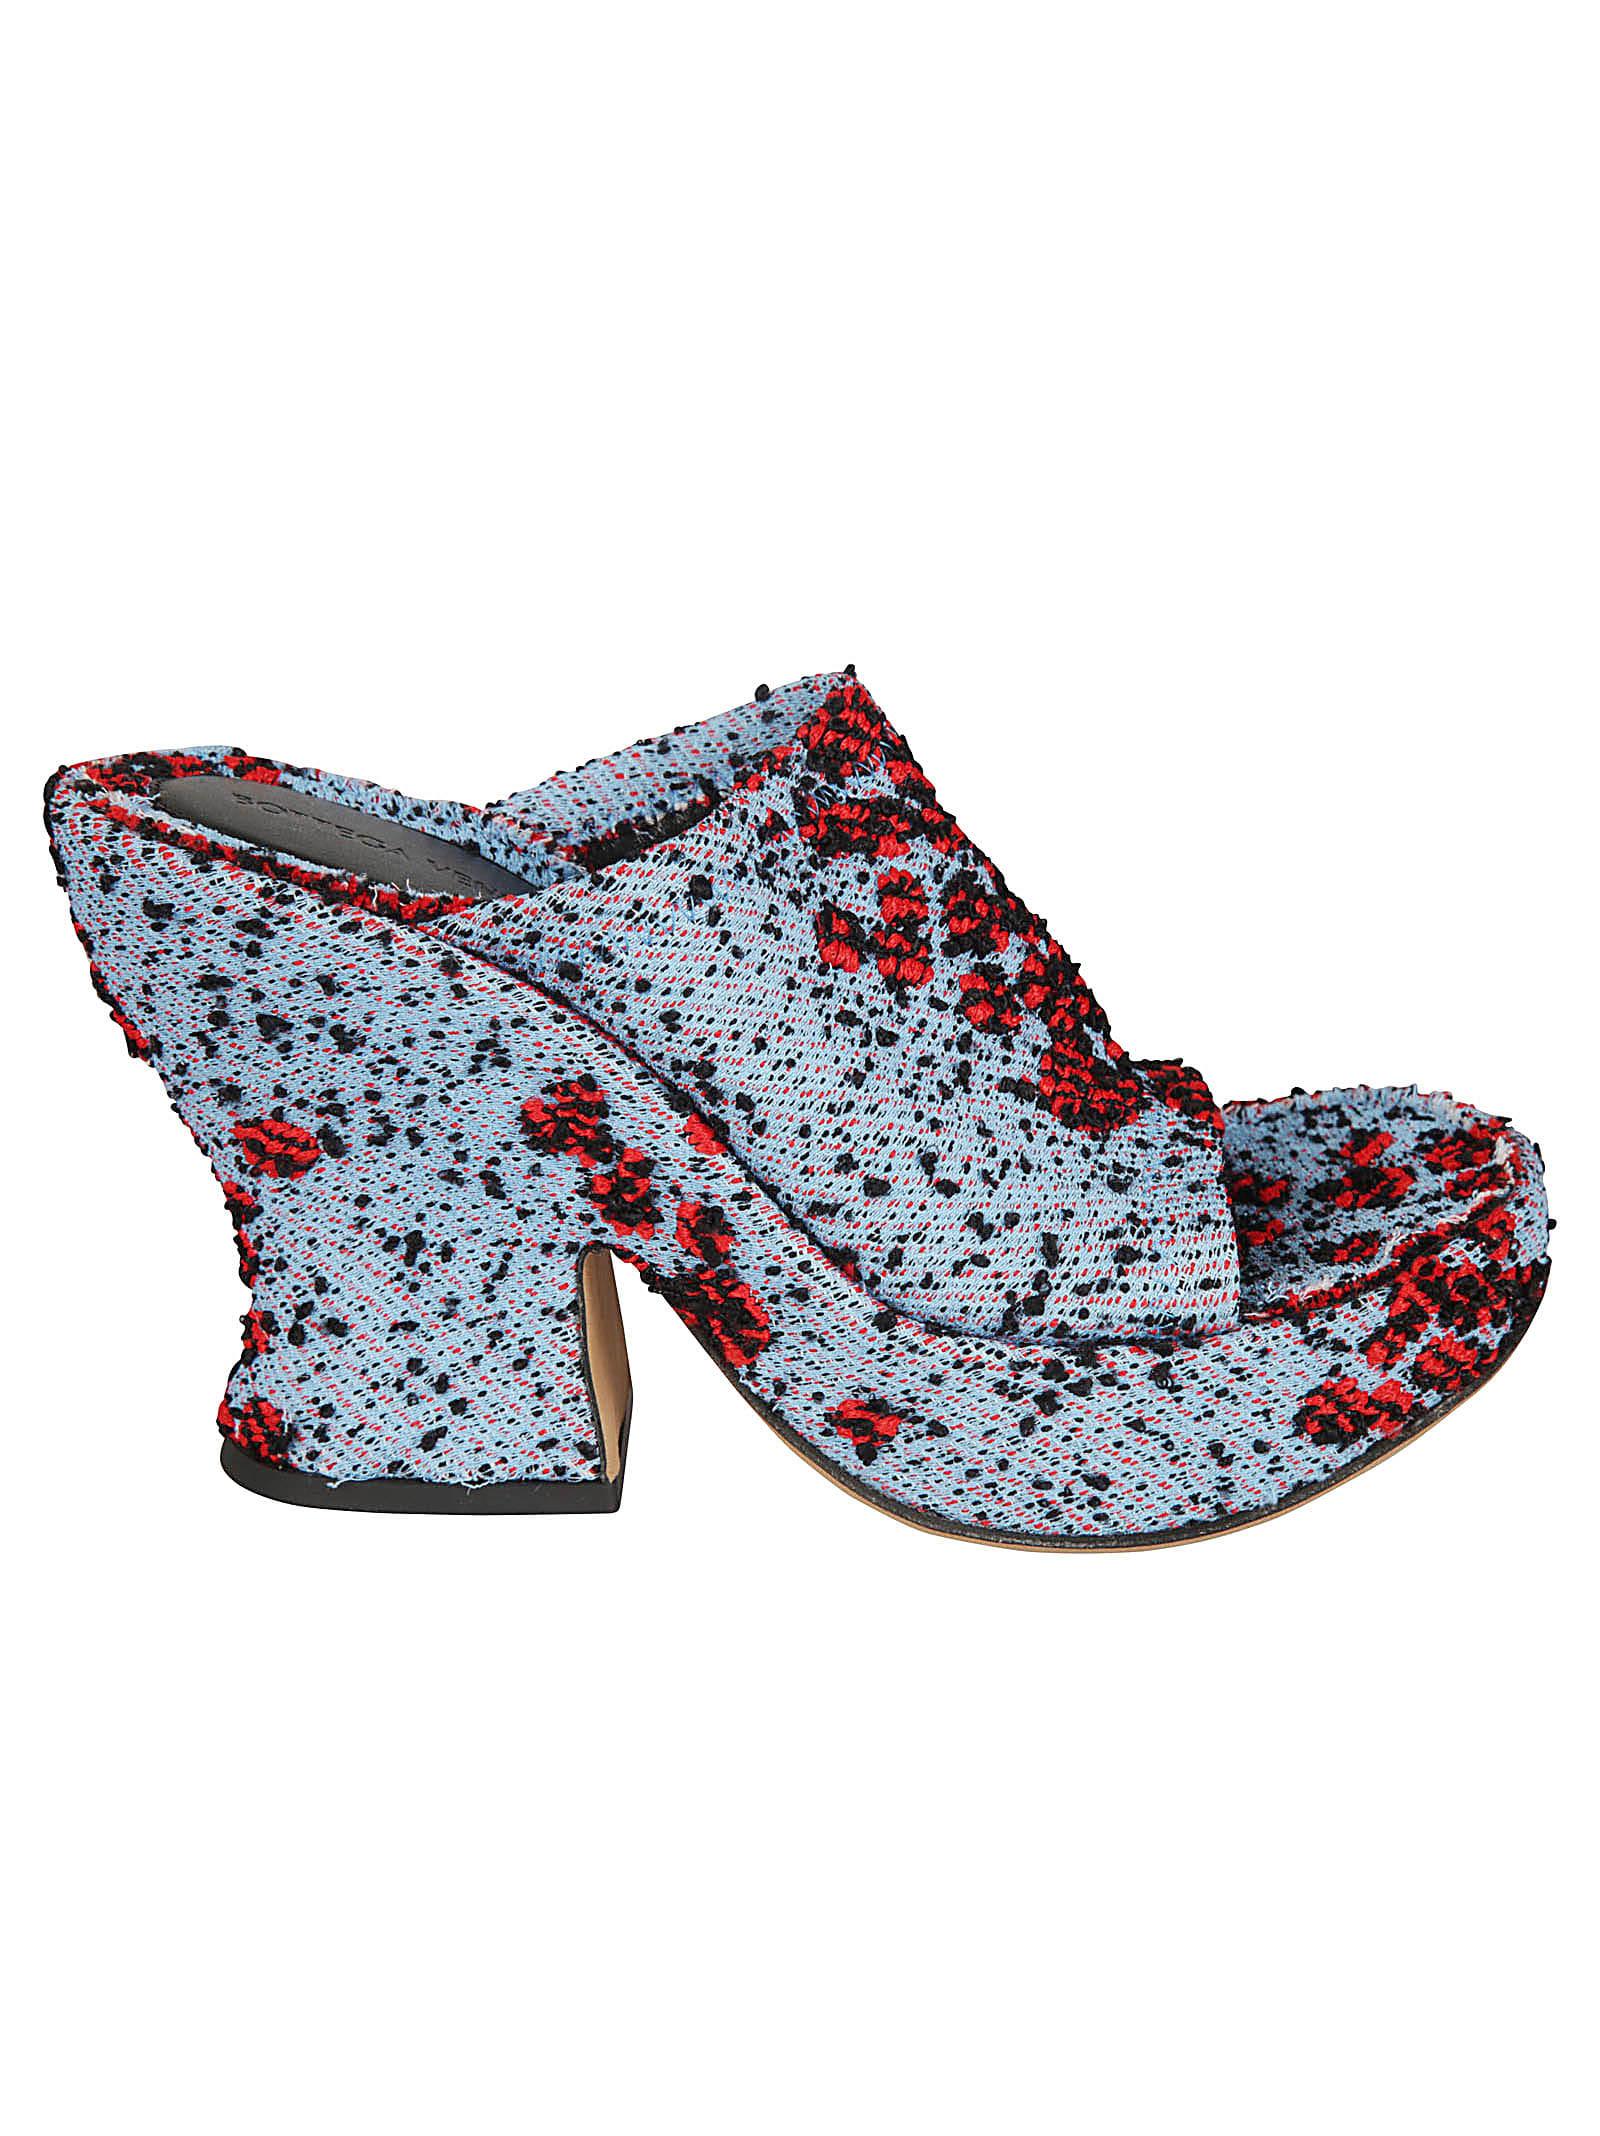 Buy Bottega Veneta Compact Bubble Sandals online, shop Bottega Veneta shoes with free shipping